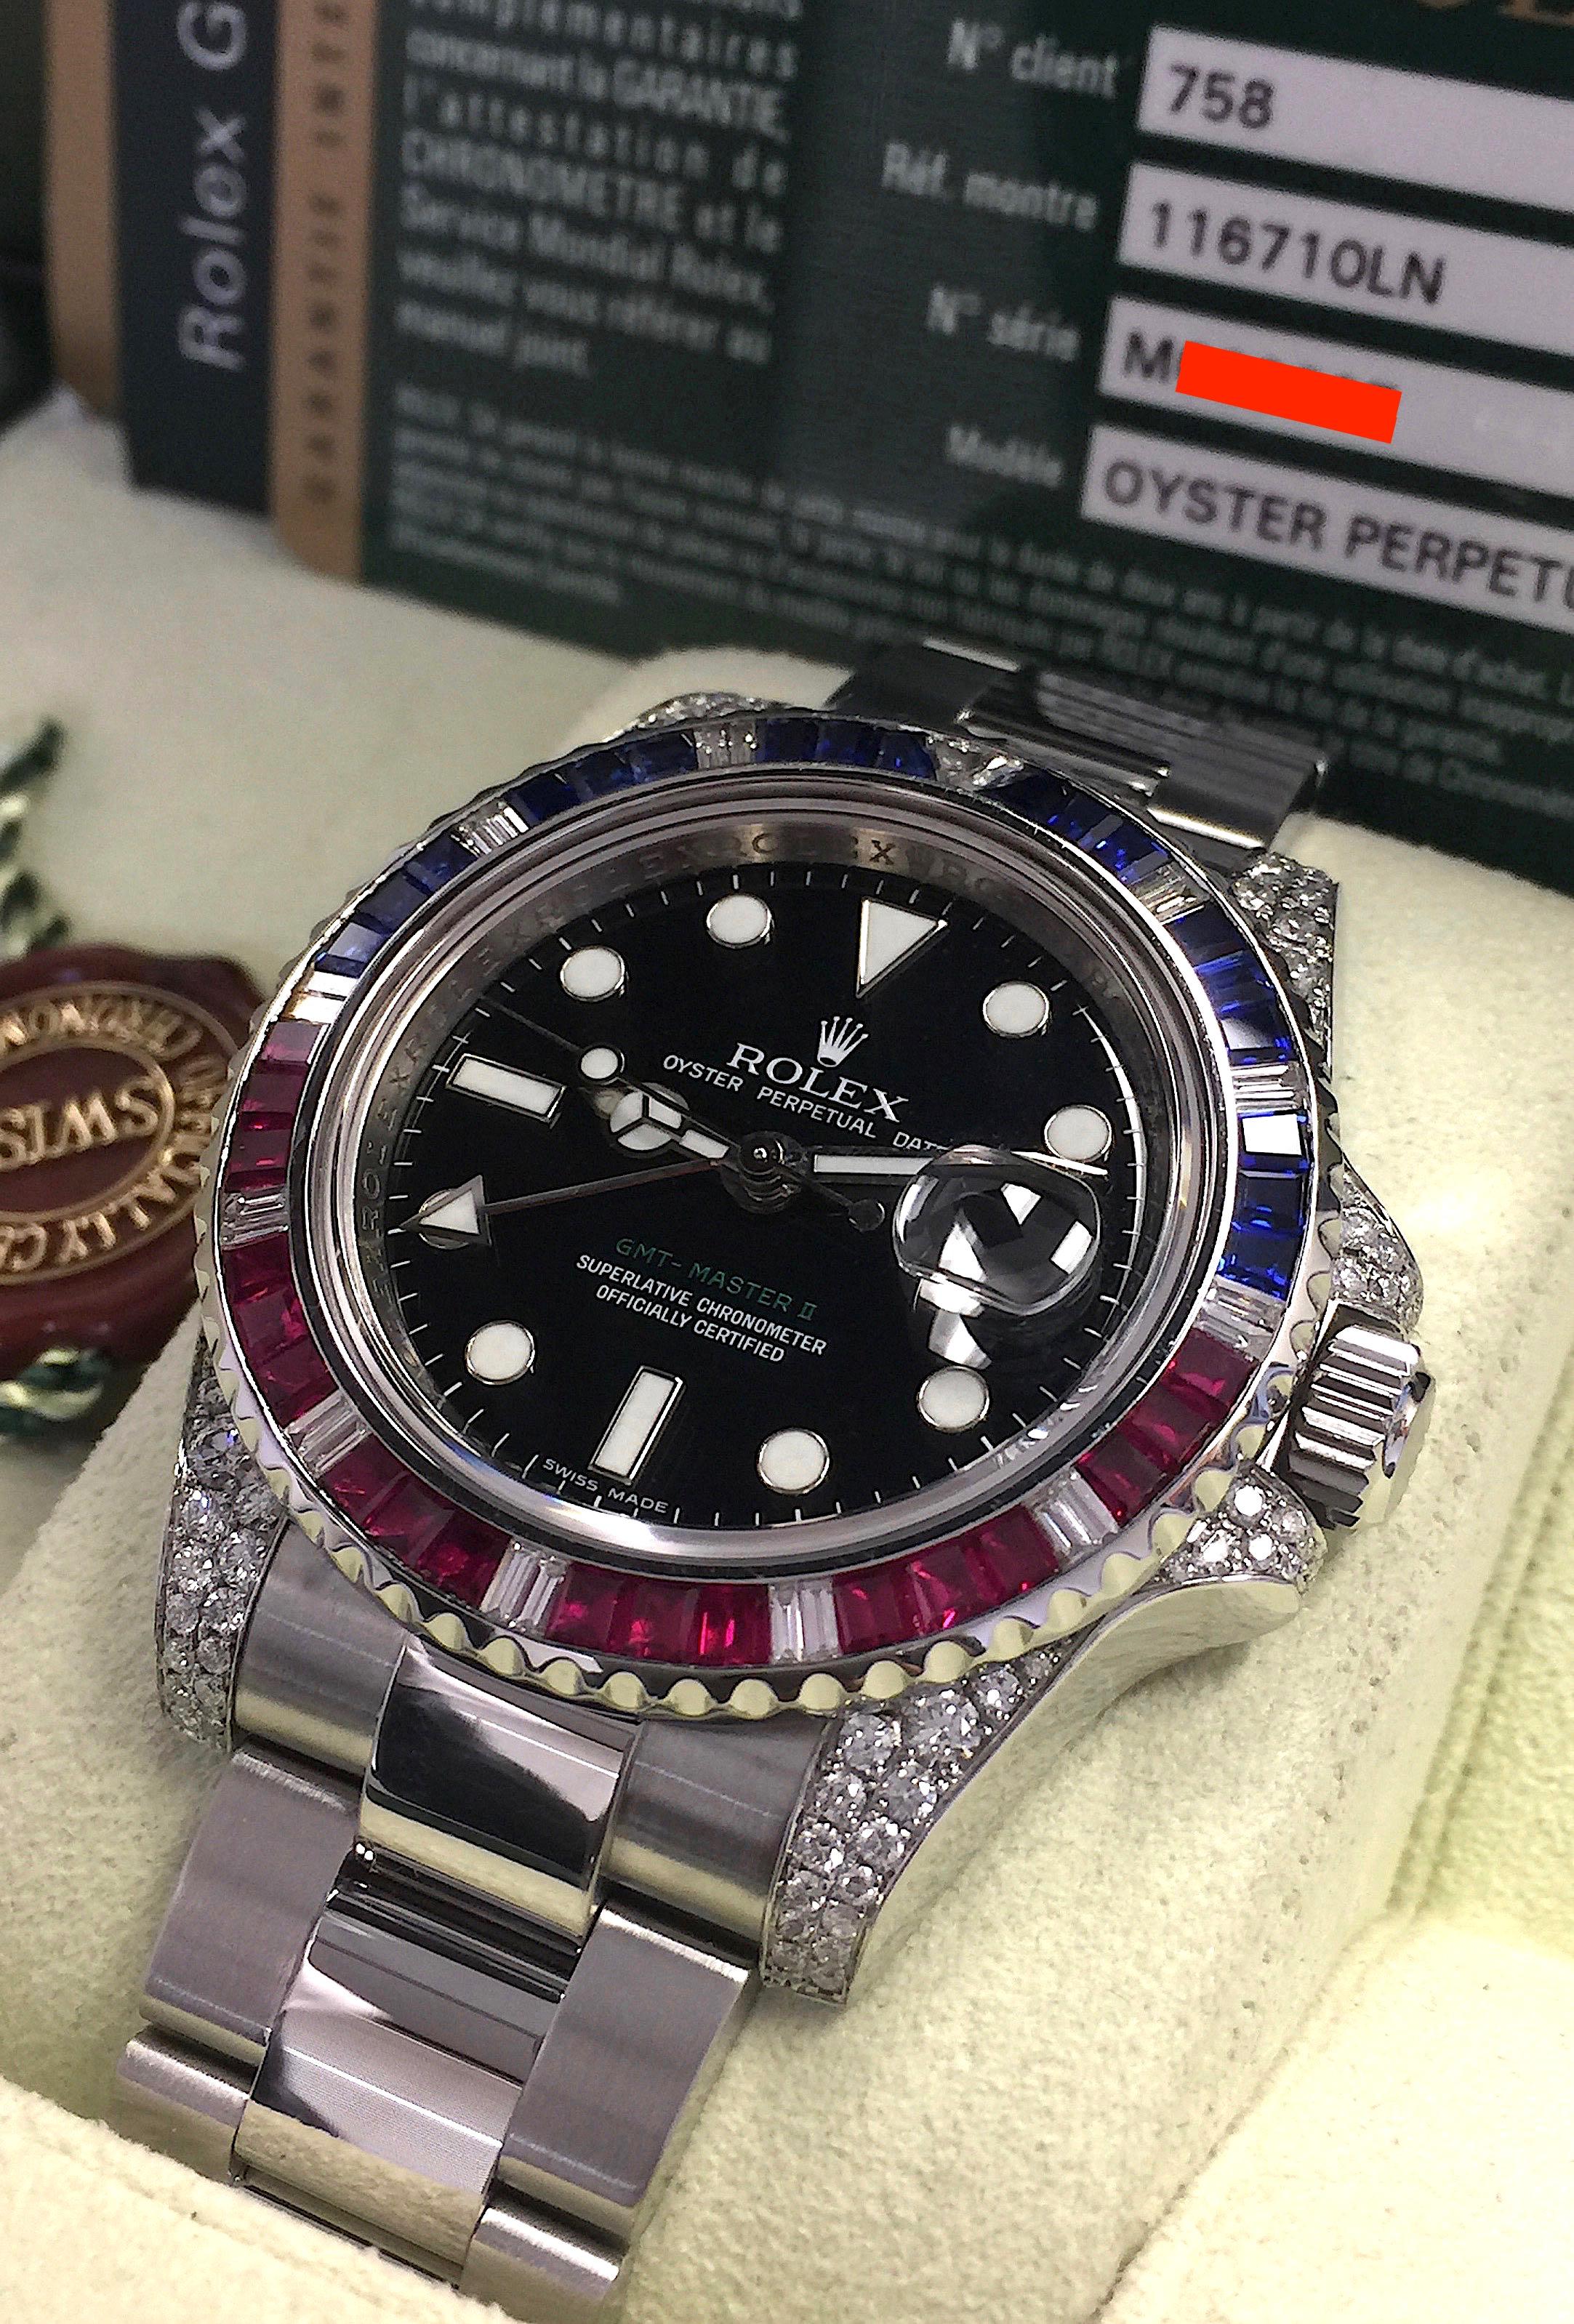 Rolex Gmt Master Ii 40mm 116710ln Stainless Steel Sapphire